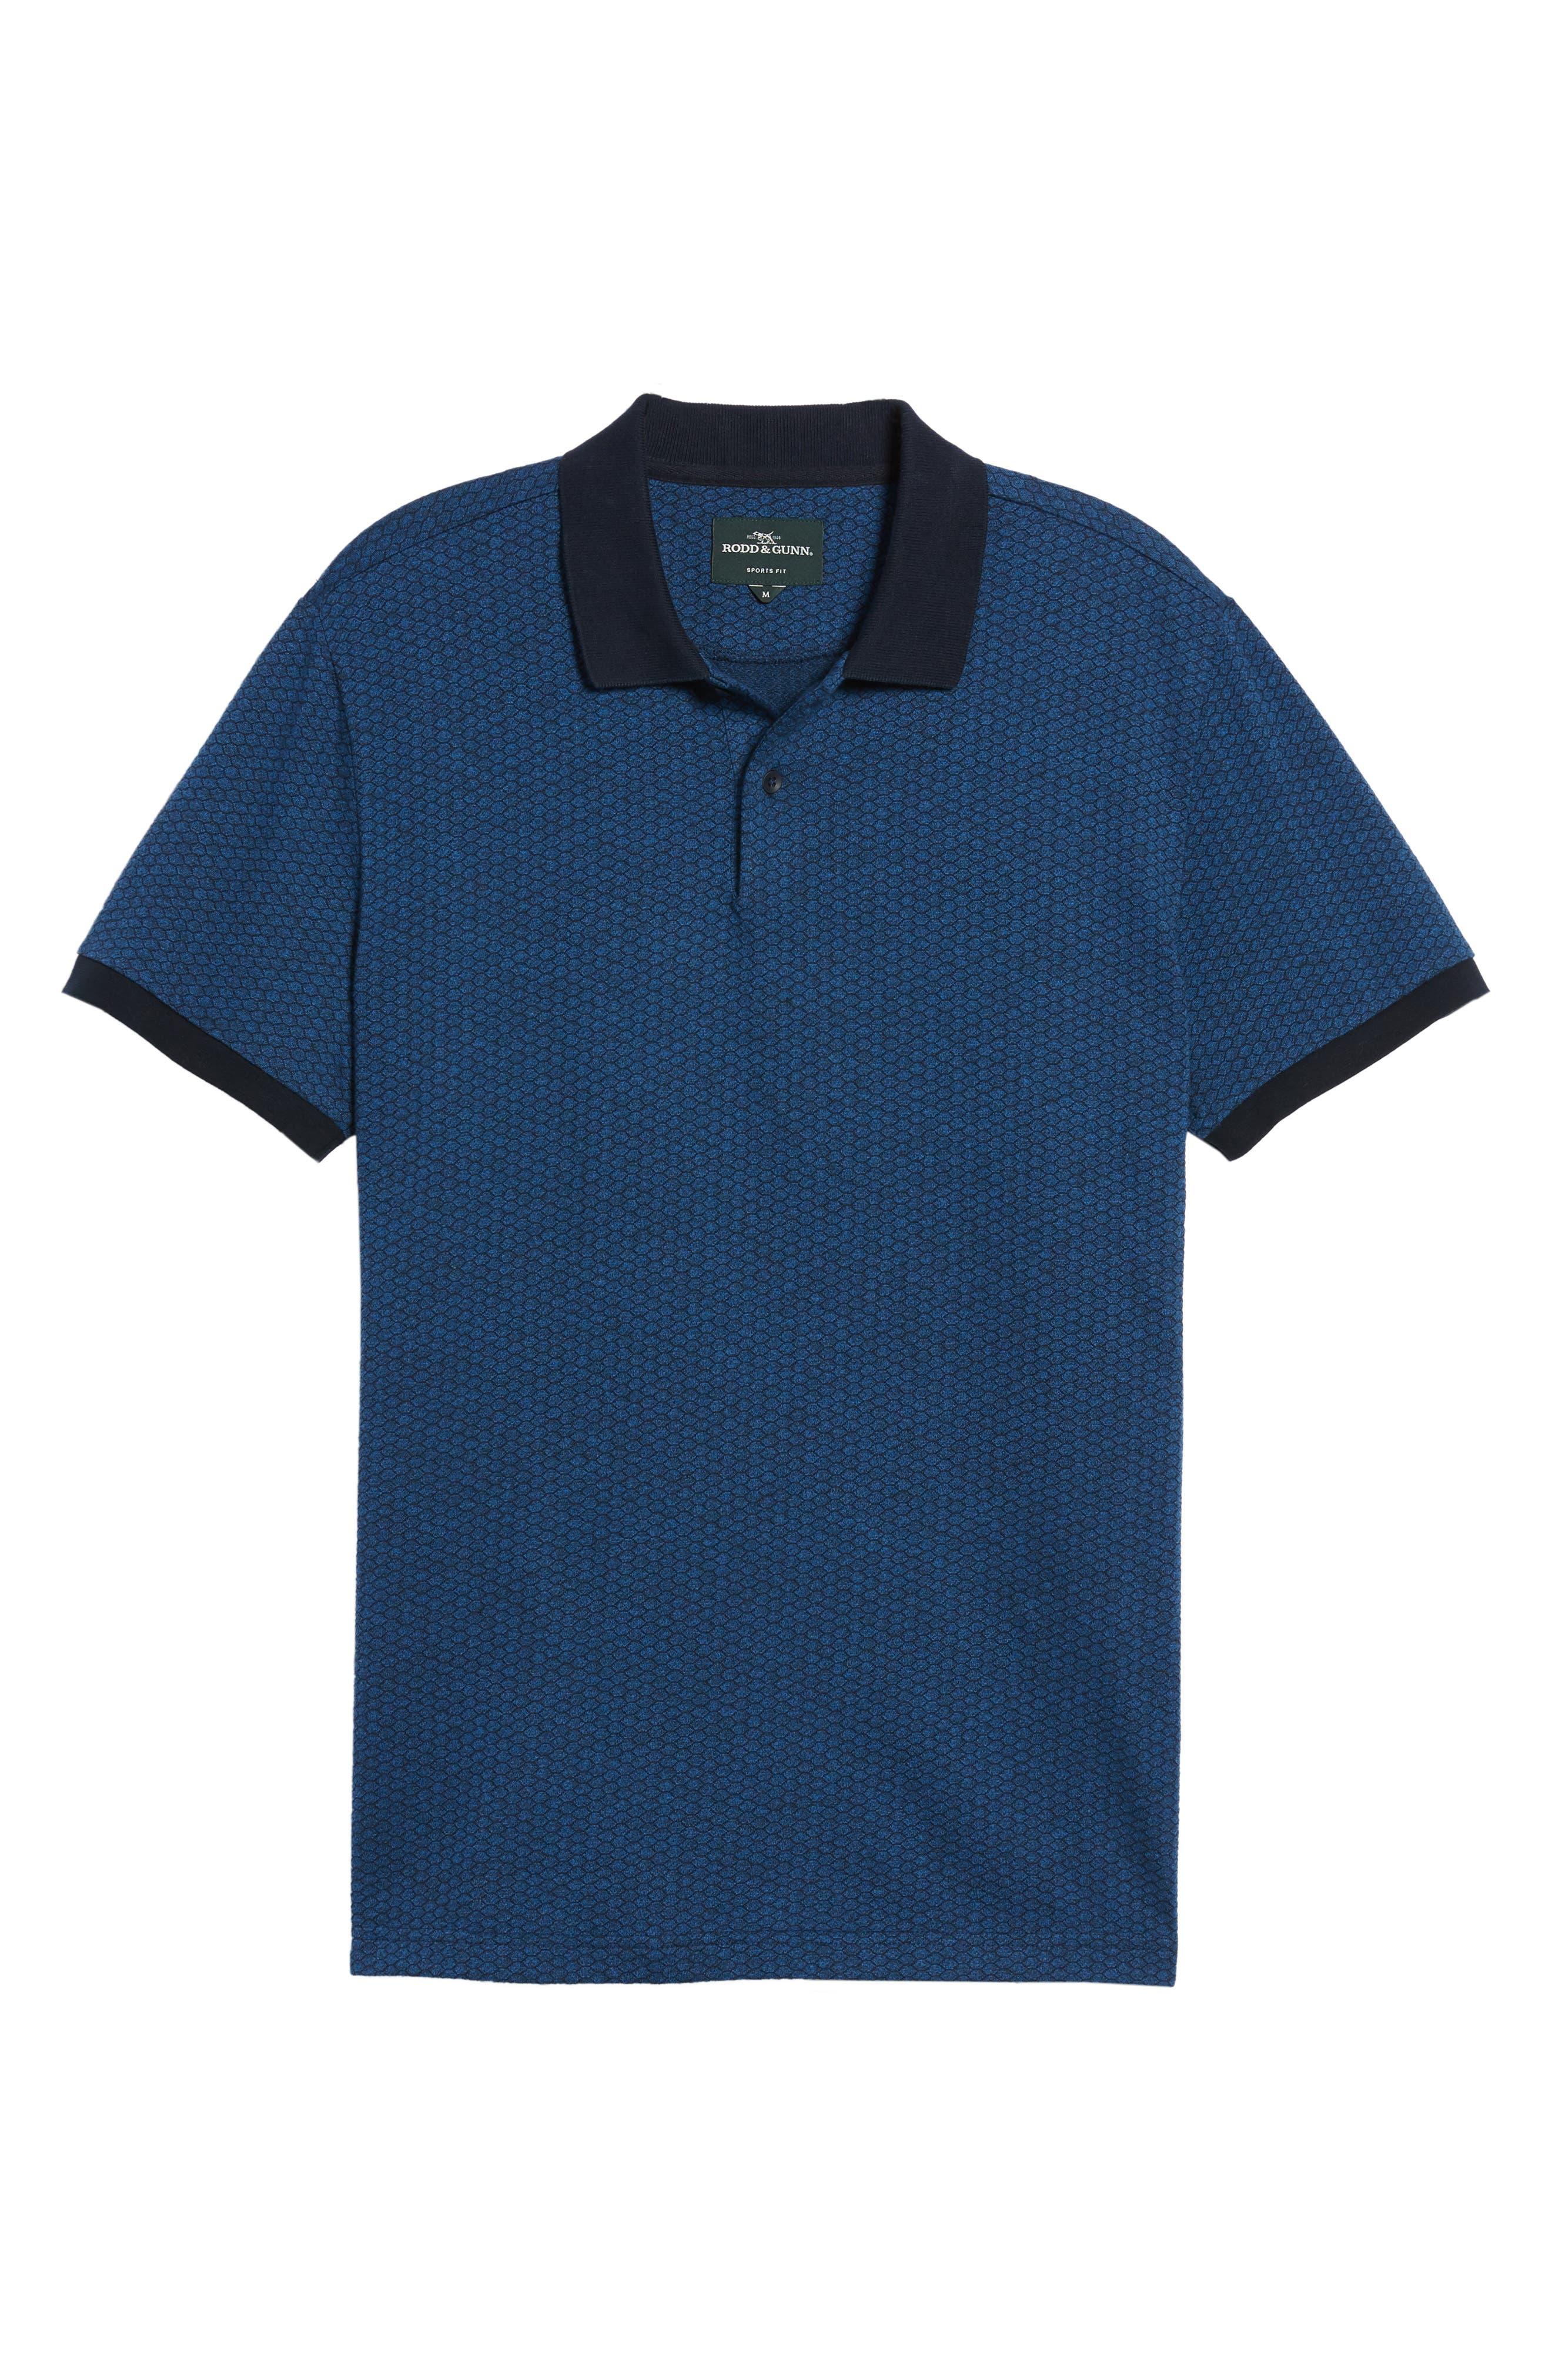 RODD & GUNN,                             Mantle Hill Sports Fit Polo,                             Alternate thumbnail 6, color,                             433